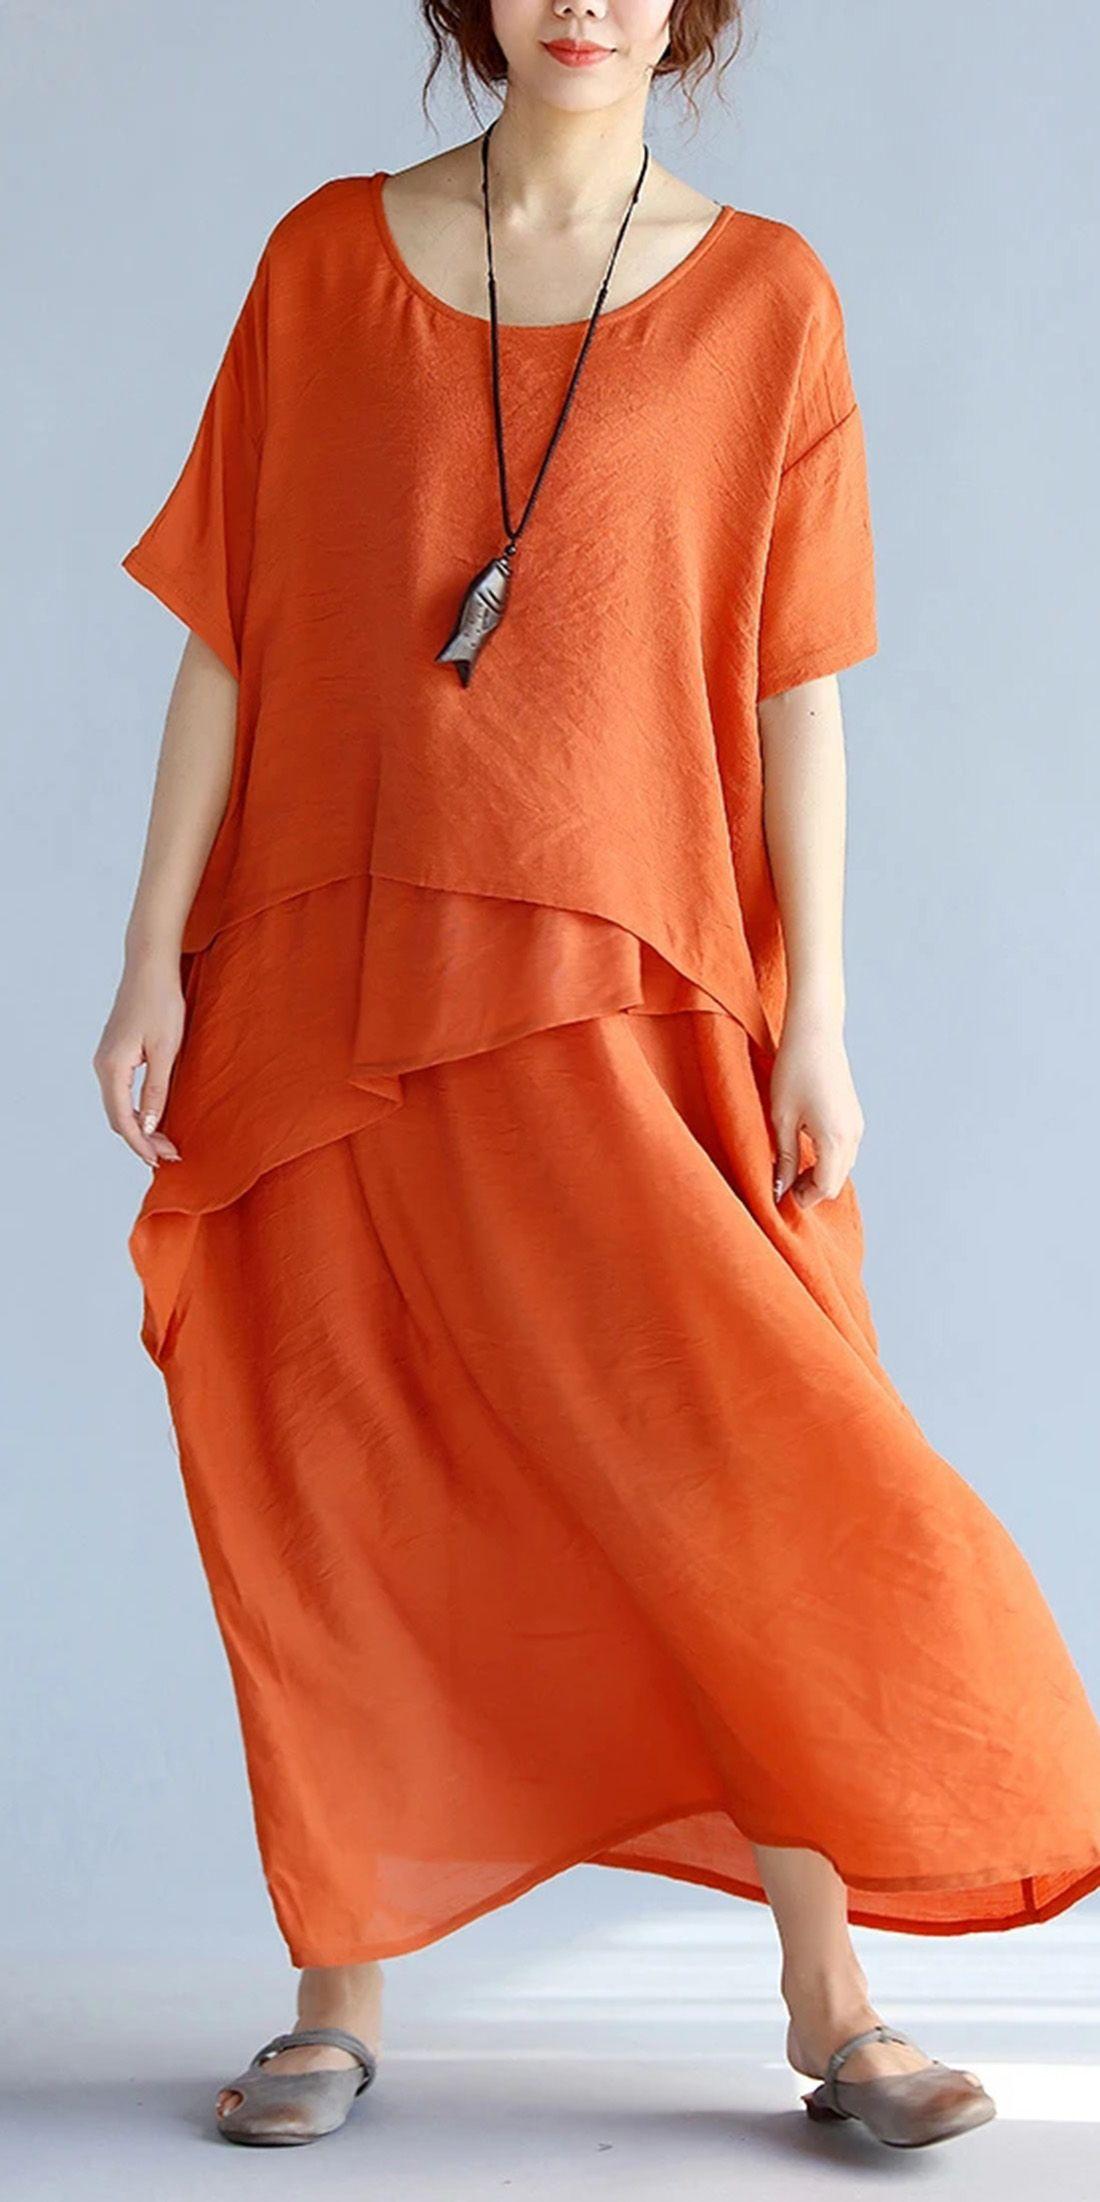 Plus size clothing Cotton dress Pink long sleeve dress Linen dresses for women Oversized dress Maxi Dresses